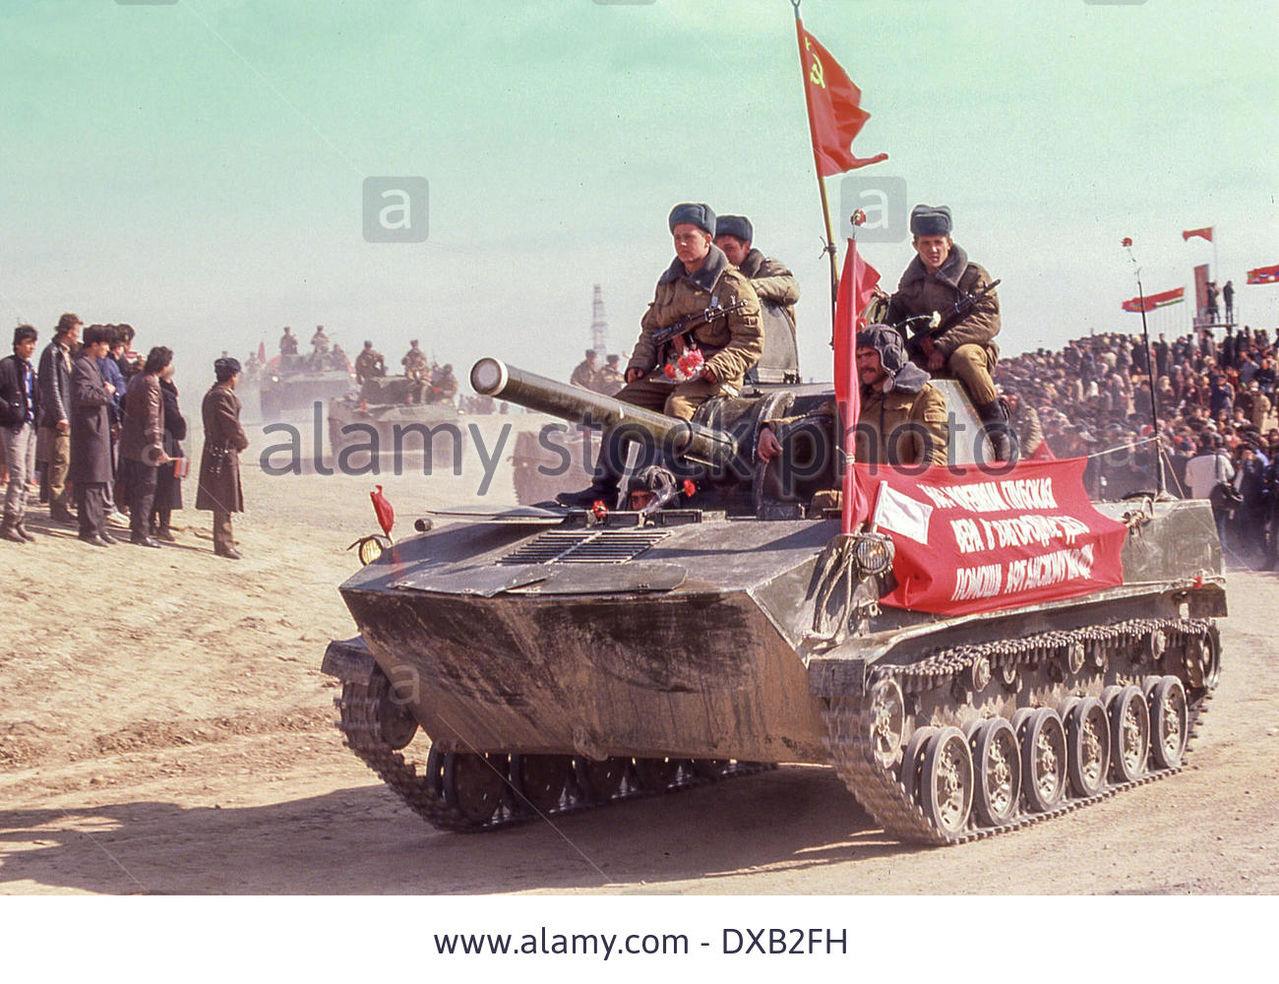 Soviet Afghanistan war - Page 5 Feb_17_1989_termez_uzbekistan_ru_a_light_tank_wi